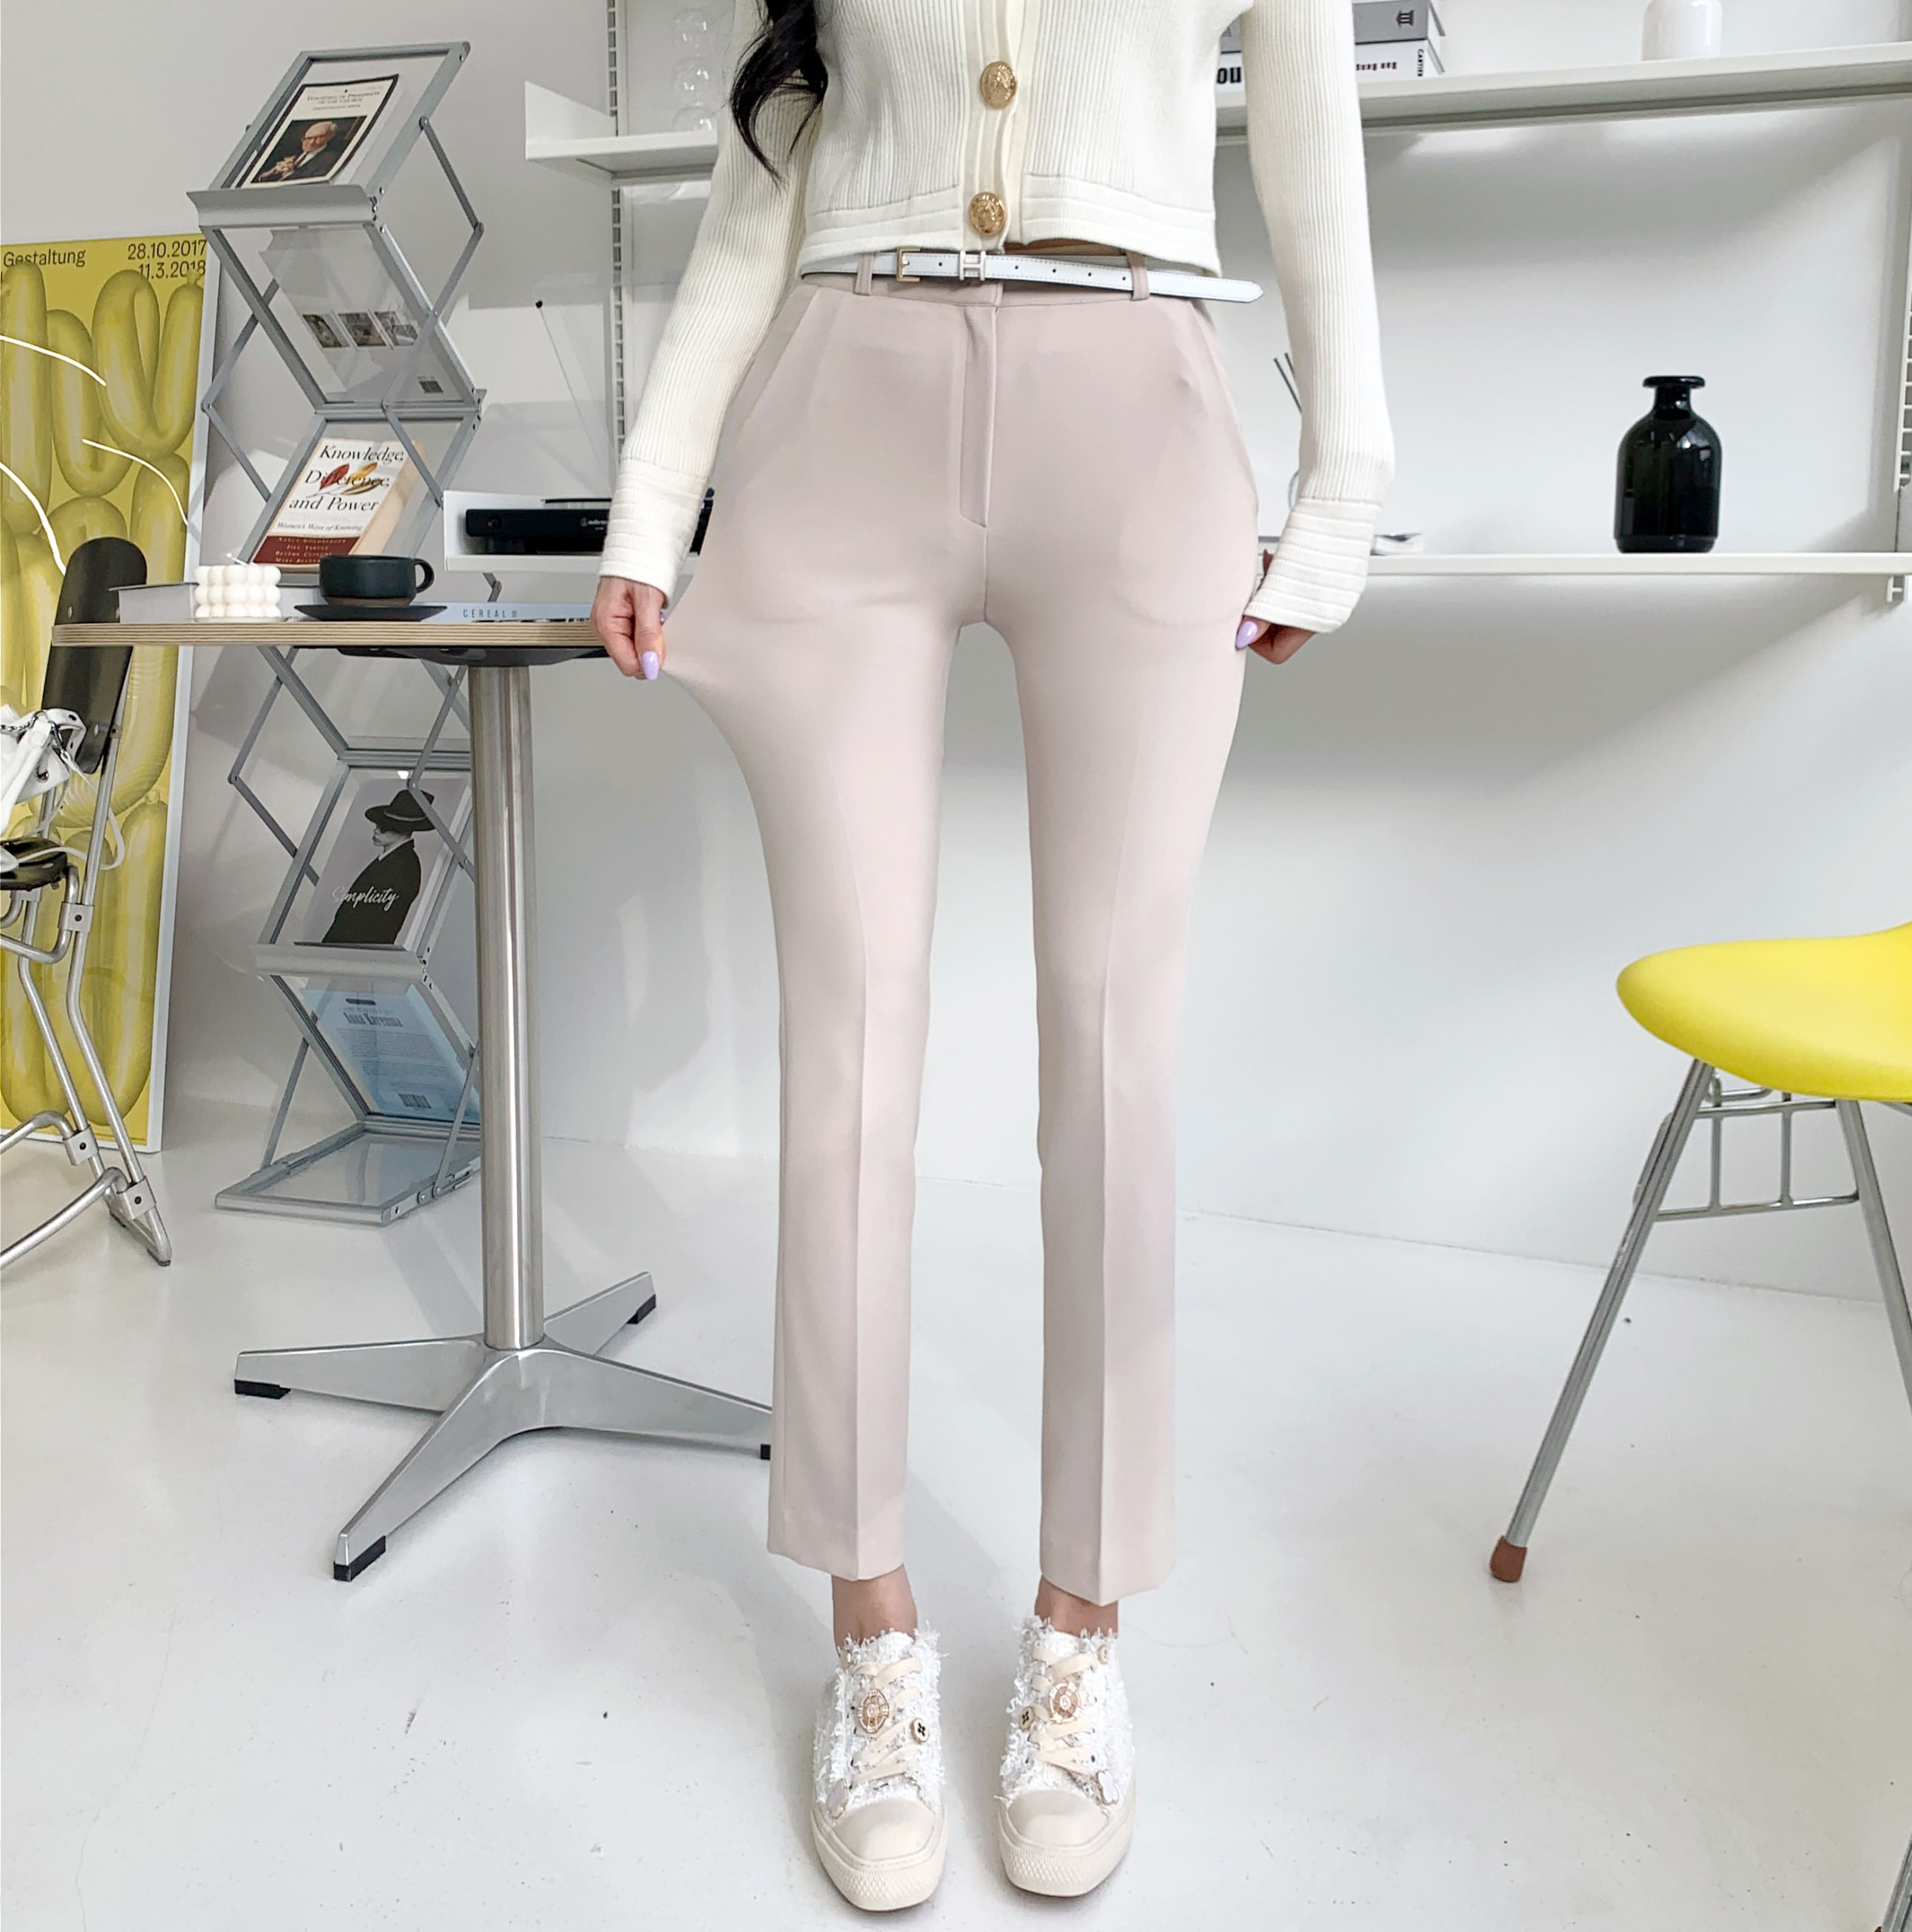 uinme-소장각 스타킹 슬랙스 - [ 5color ] - 유인미소장각 스타킹 슬랙스 - [ 5color ] - 유인미♡韓國女裝褲